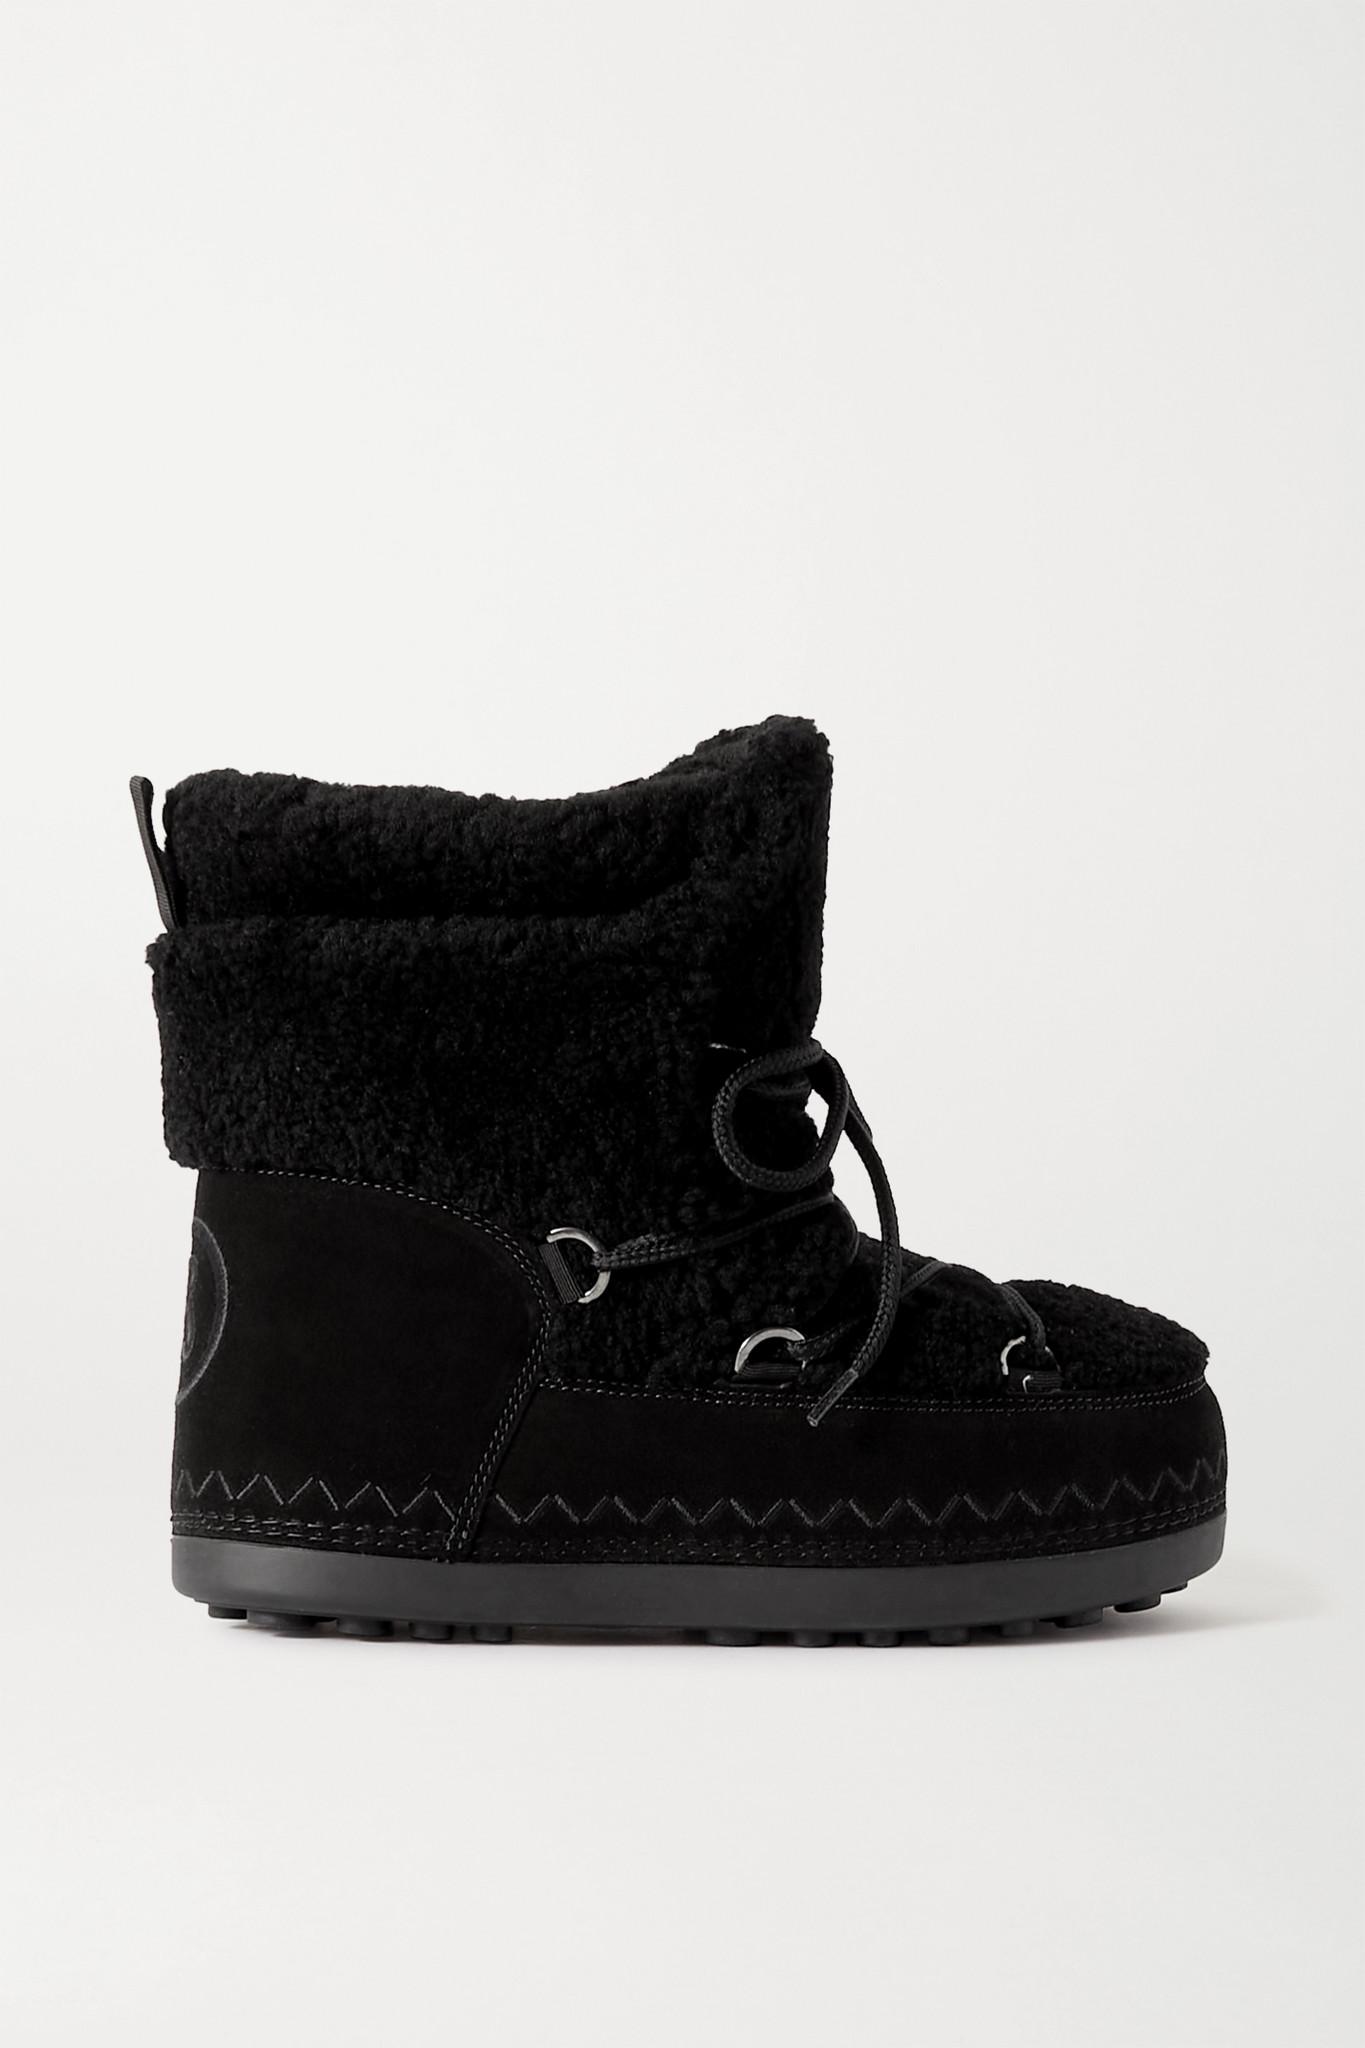 BOGNER - Trois Vallées 15a 绒面革羊毛皮雪地靴 - 黑色 - M